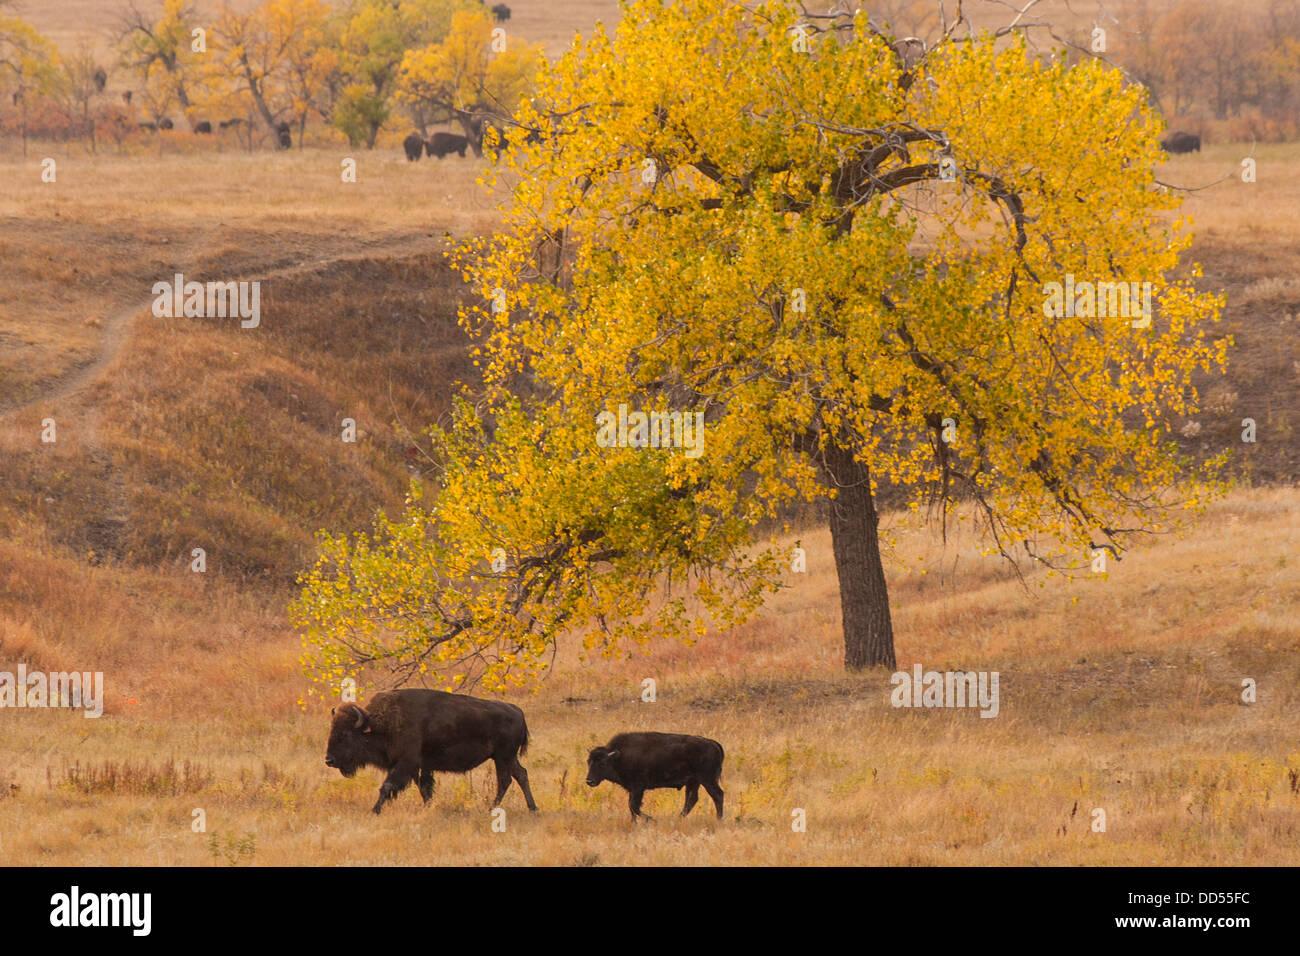 USA, South Dakota, Custer State Park. Bison mother and calf. - Stock Image